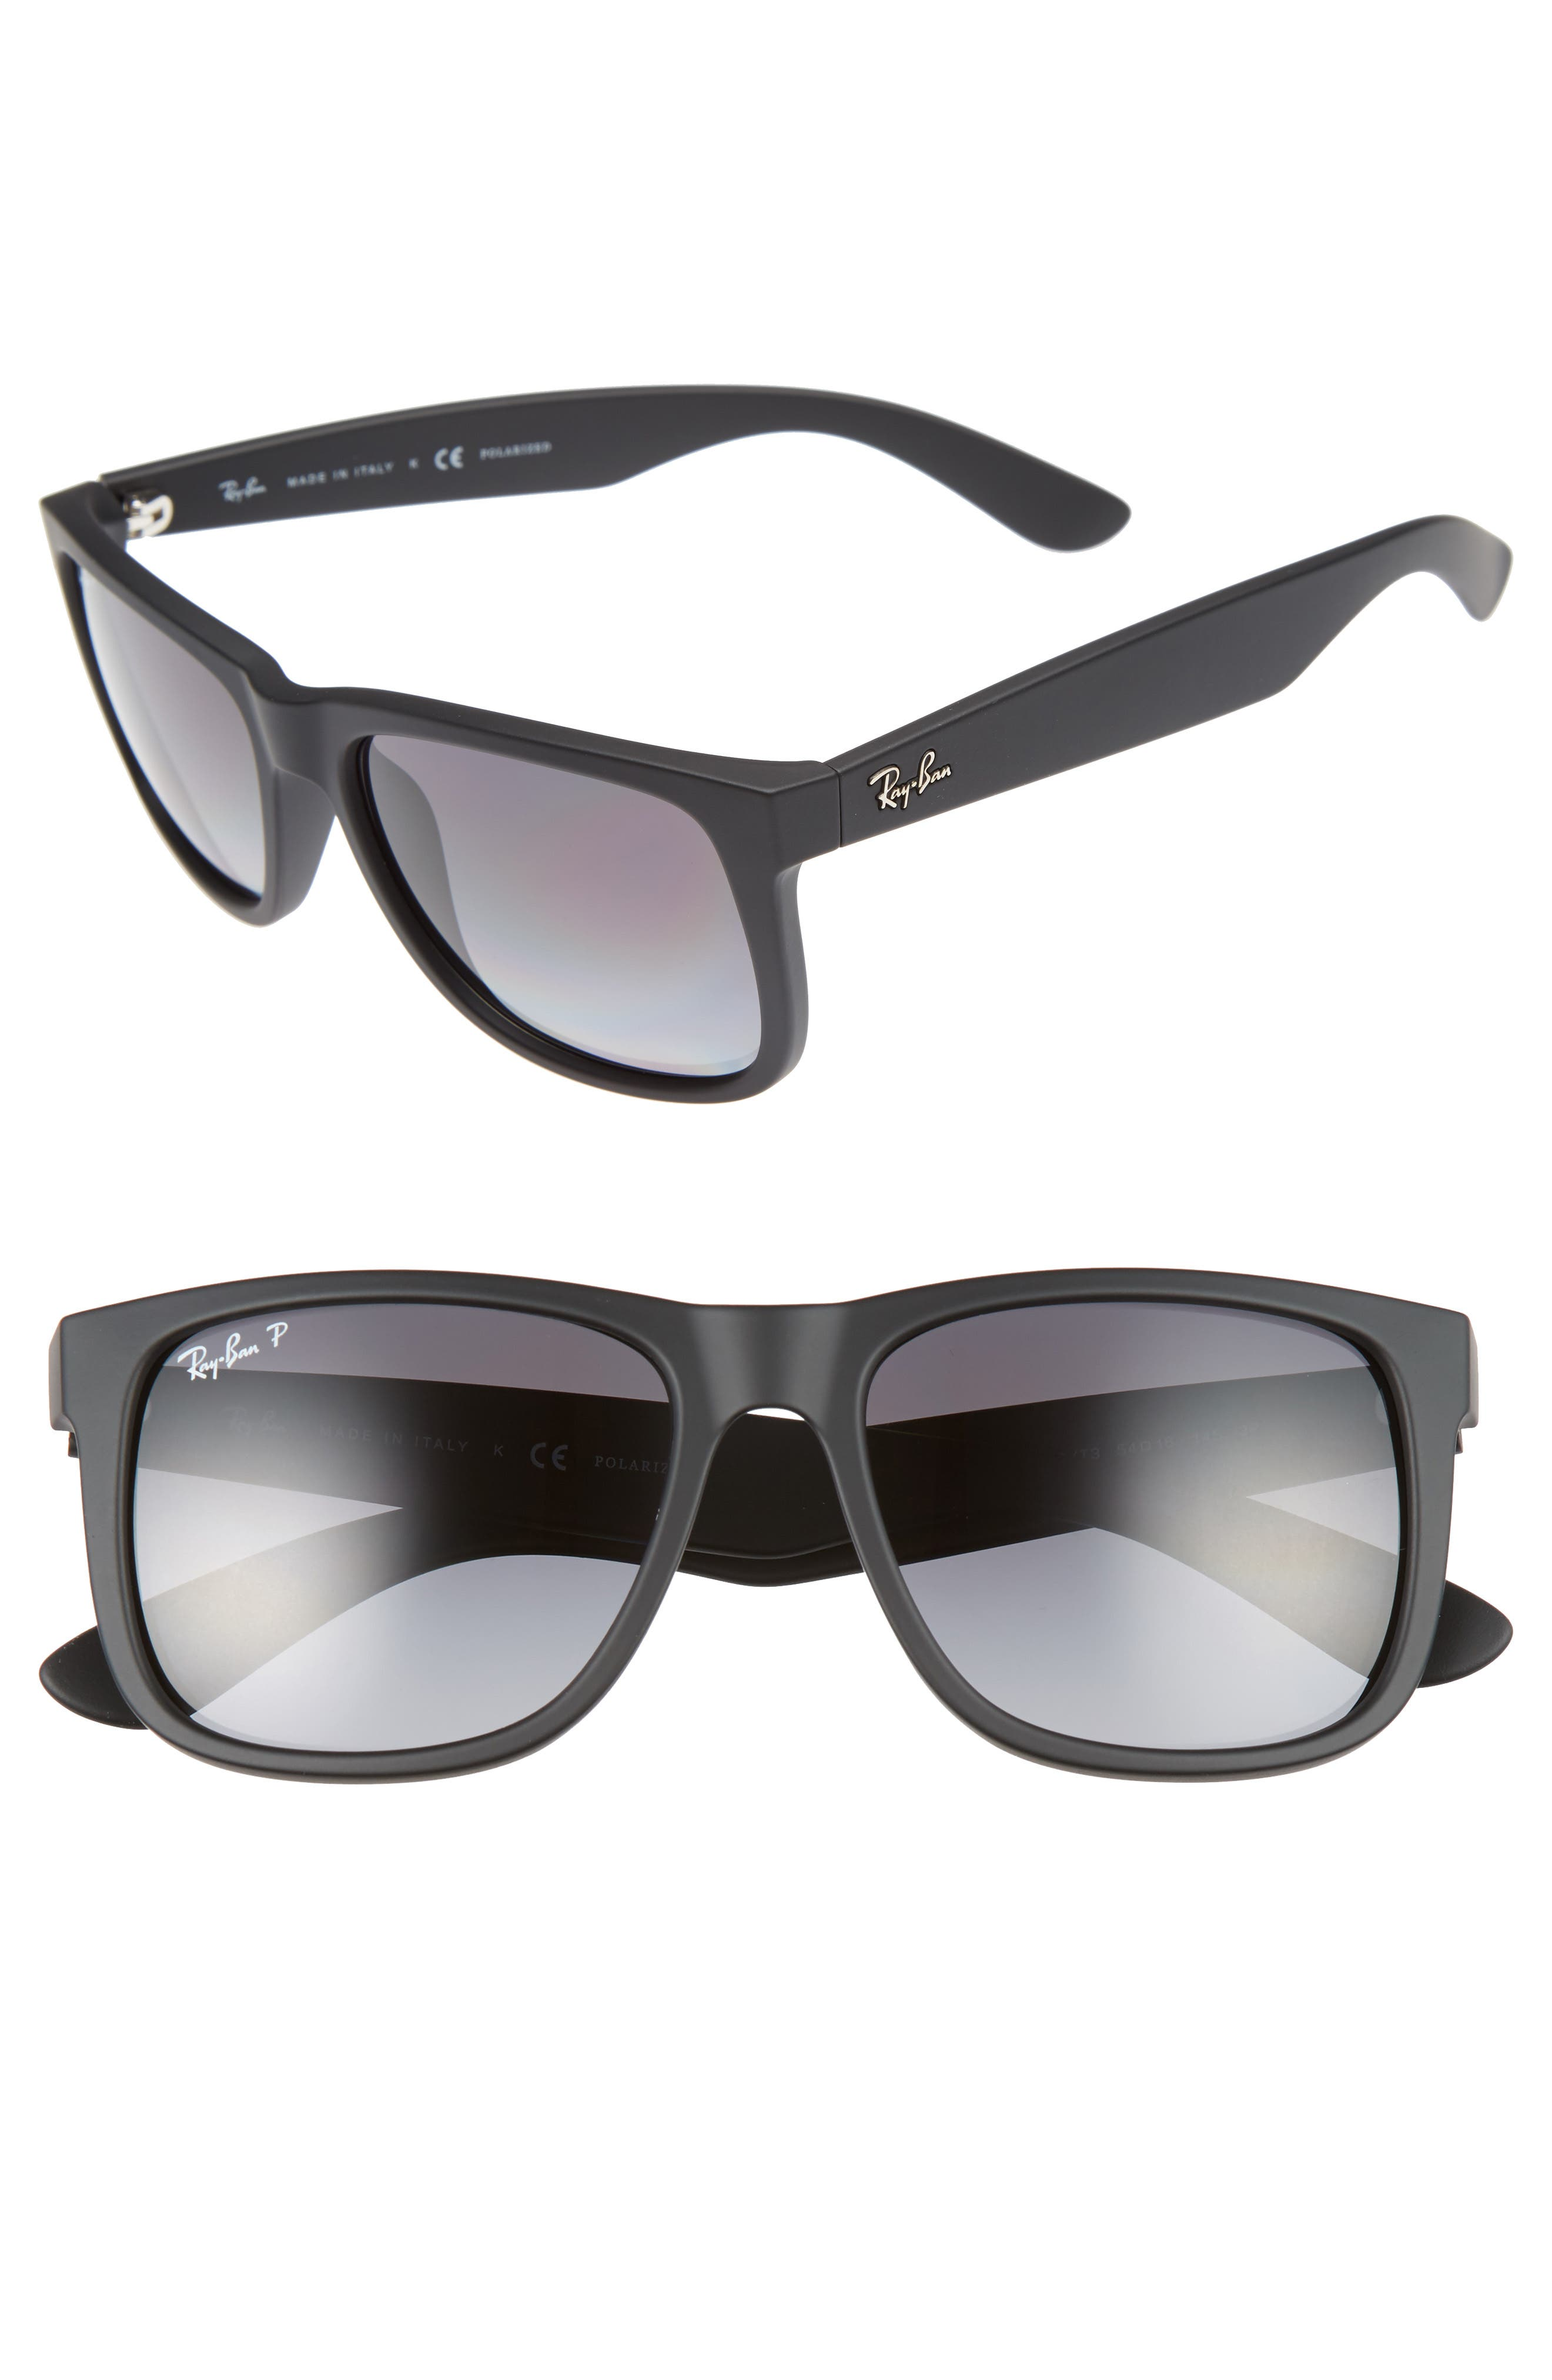 Justin 54mm Polarized Sunglasses,                             Main thumbnail 1, color,                             Matte Dark Grey